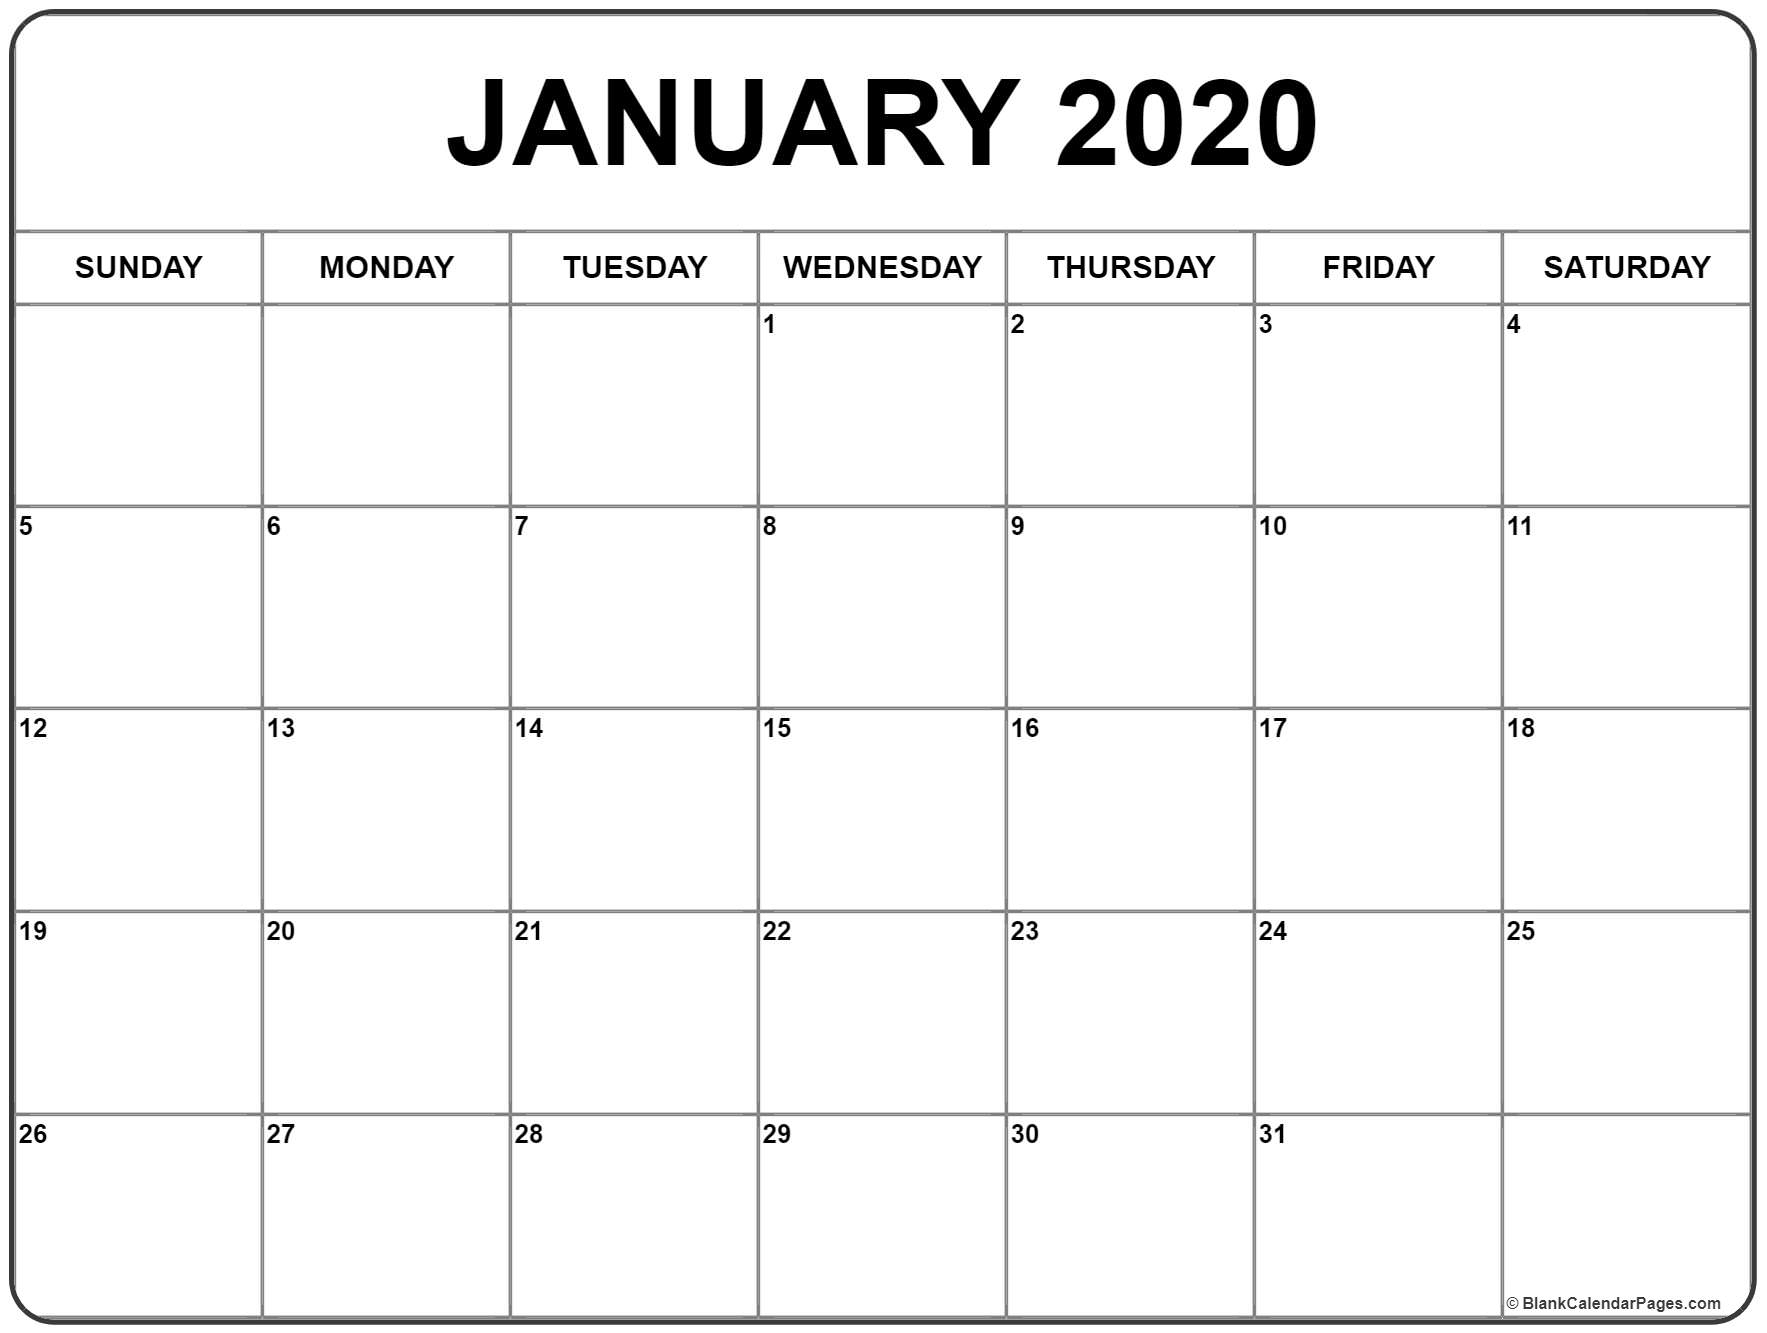 Blank Calendar 2020 Monthly - Wpa.wpart.co